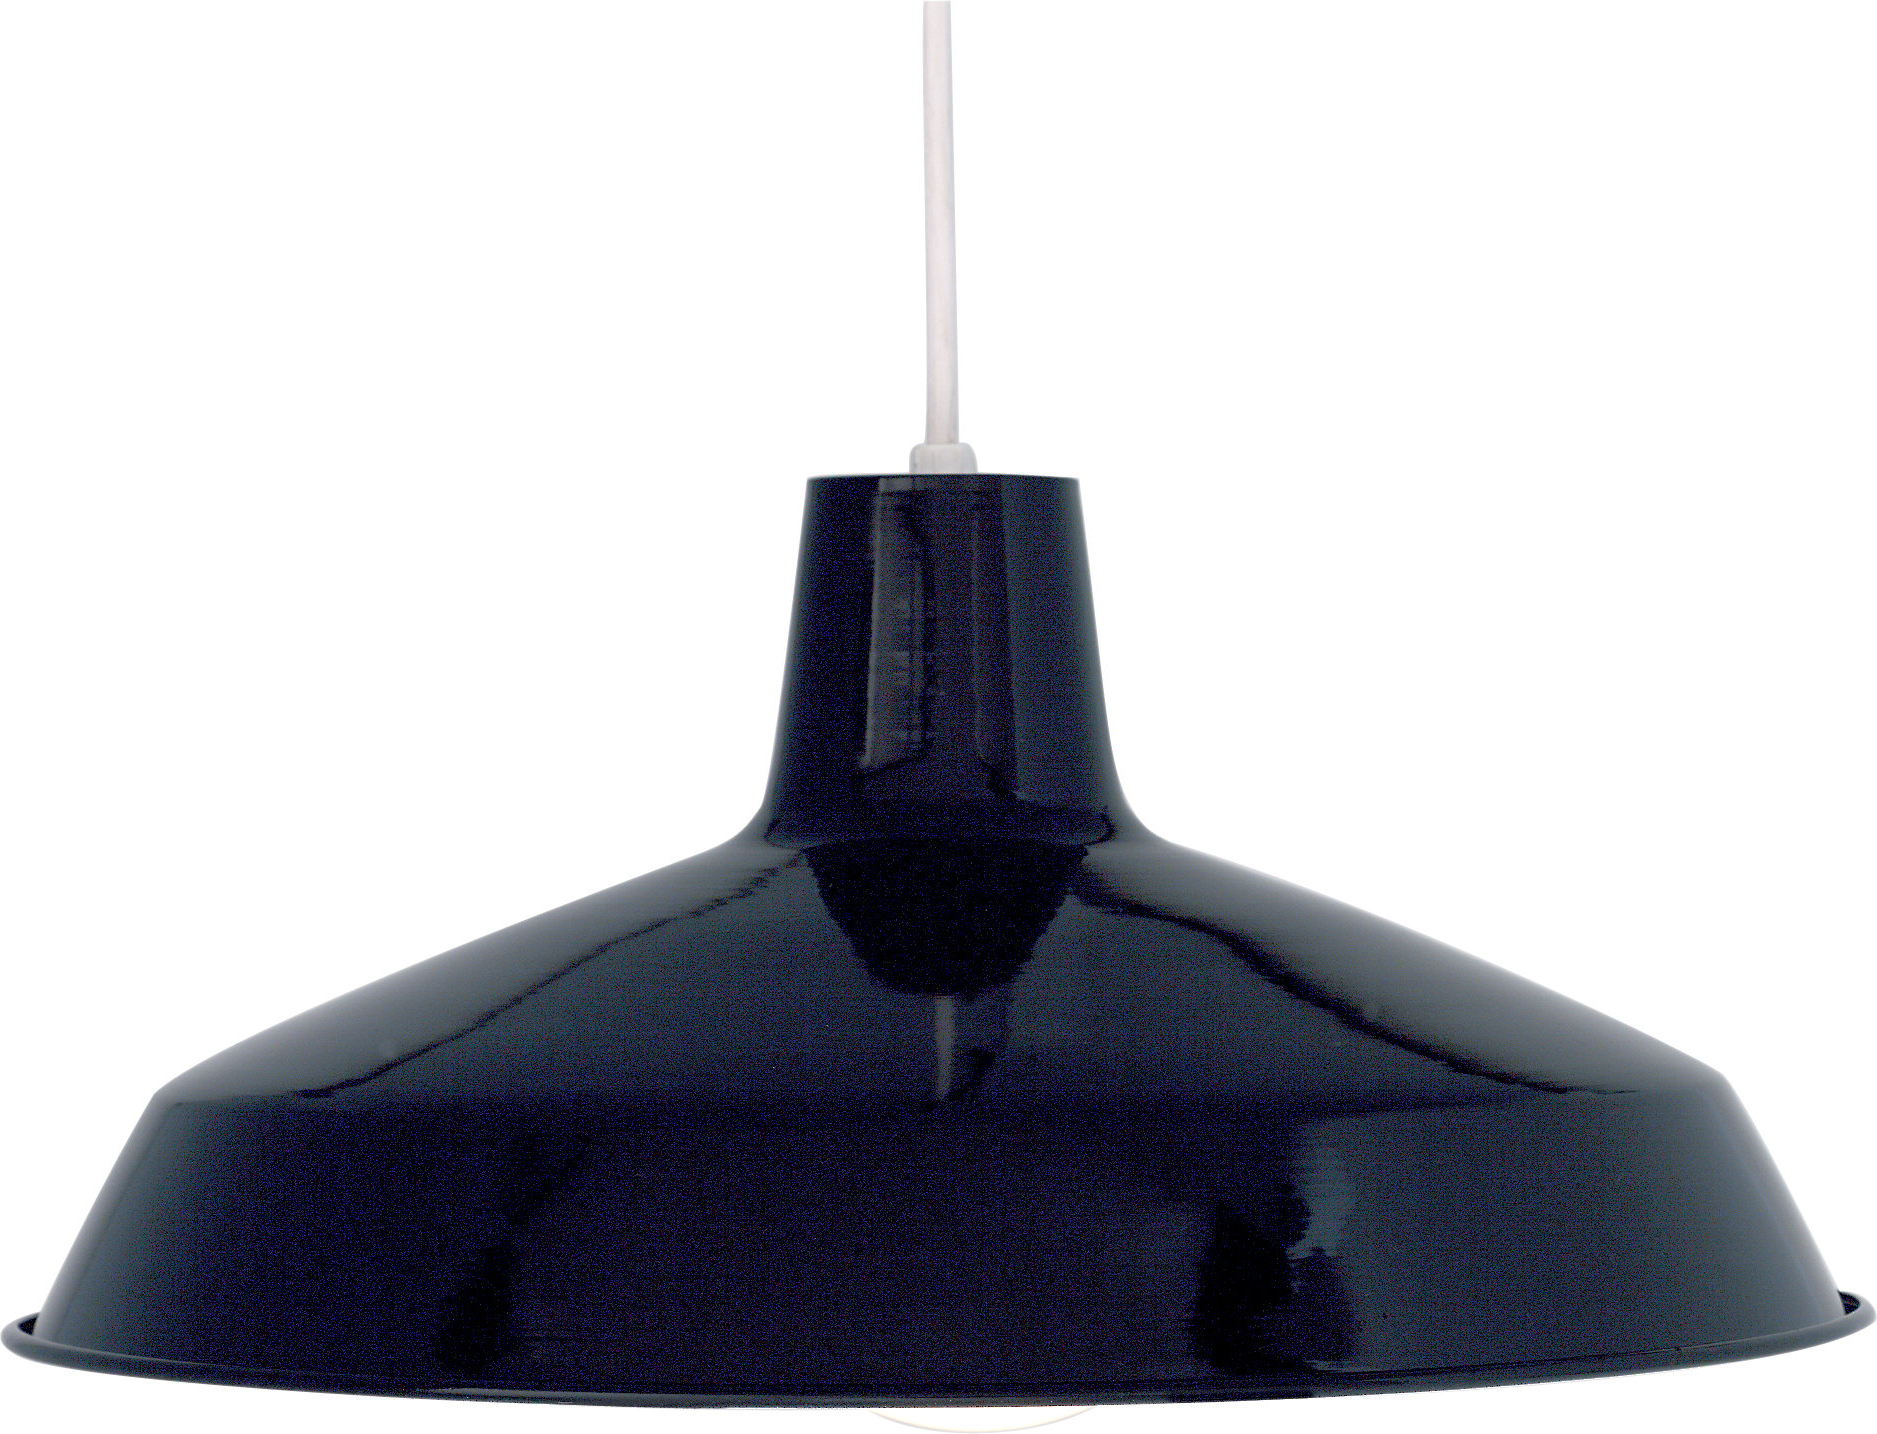 Gattis 1 Light Dome Pendant Regarding Most Current Gattis 1 Light Dome Pendants (View 2 of 20)